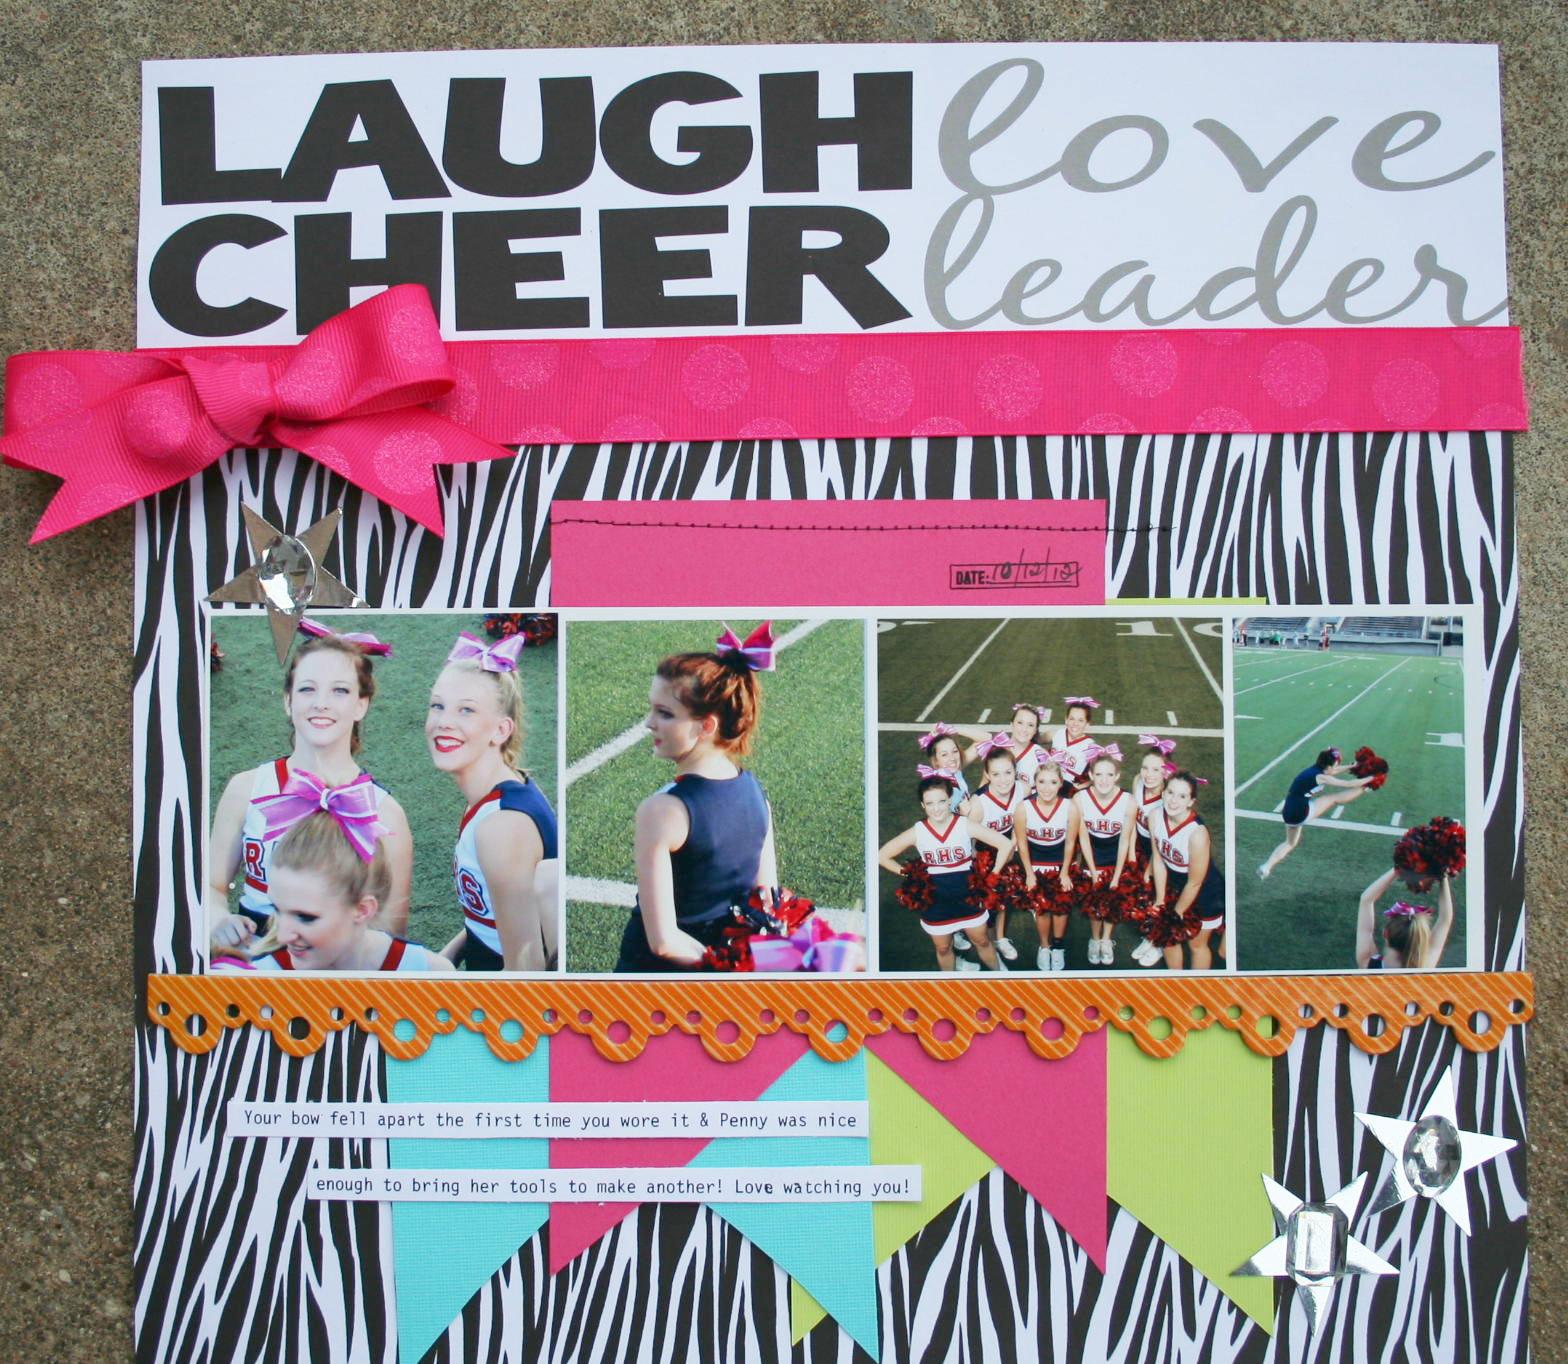 Laugh, Love, Cheer, Leader